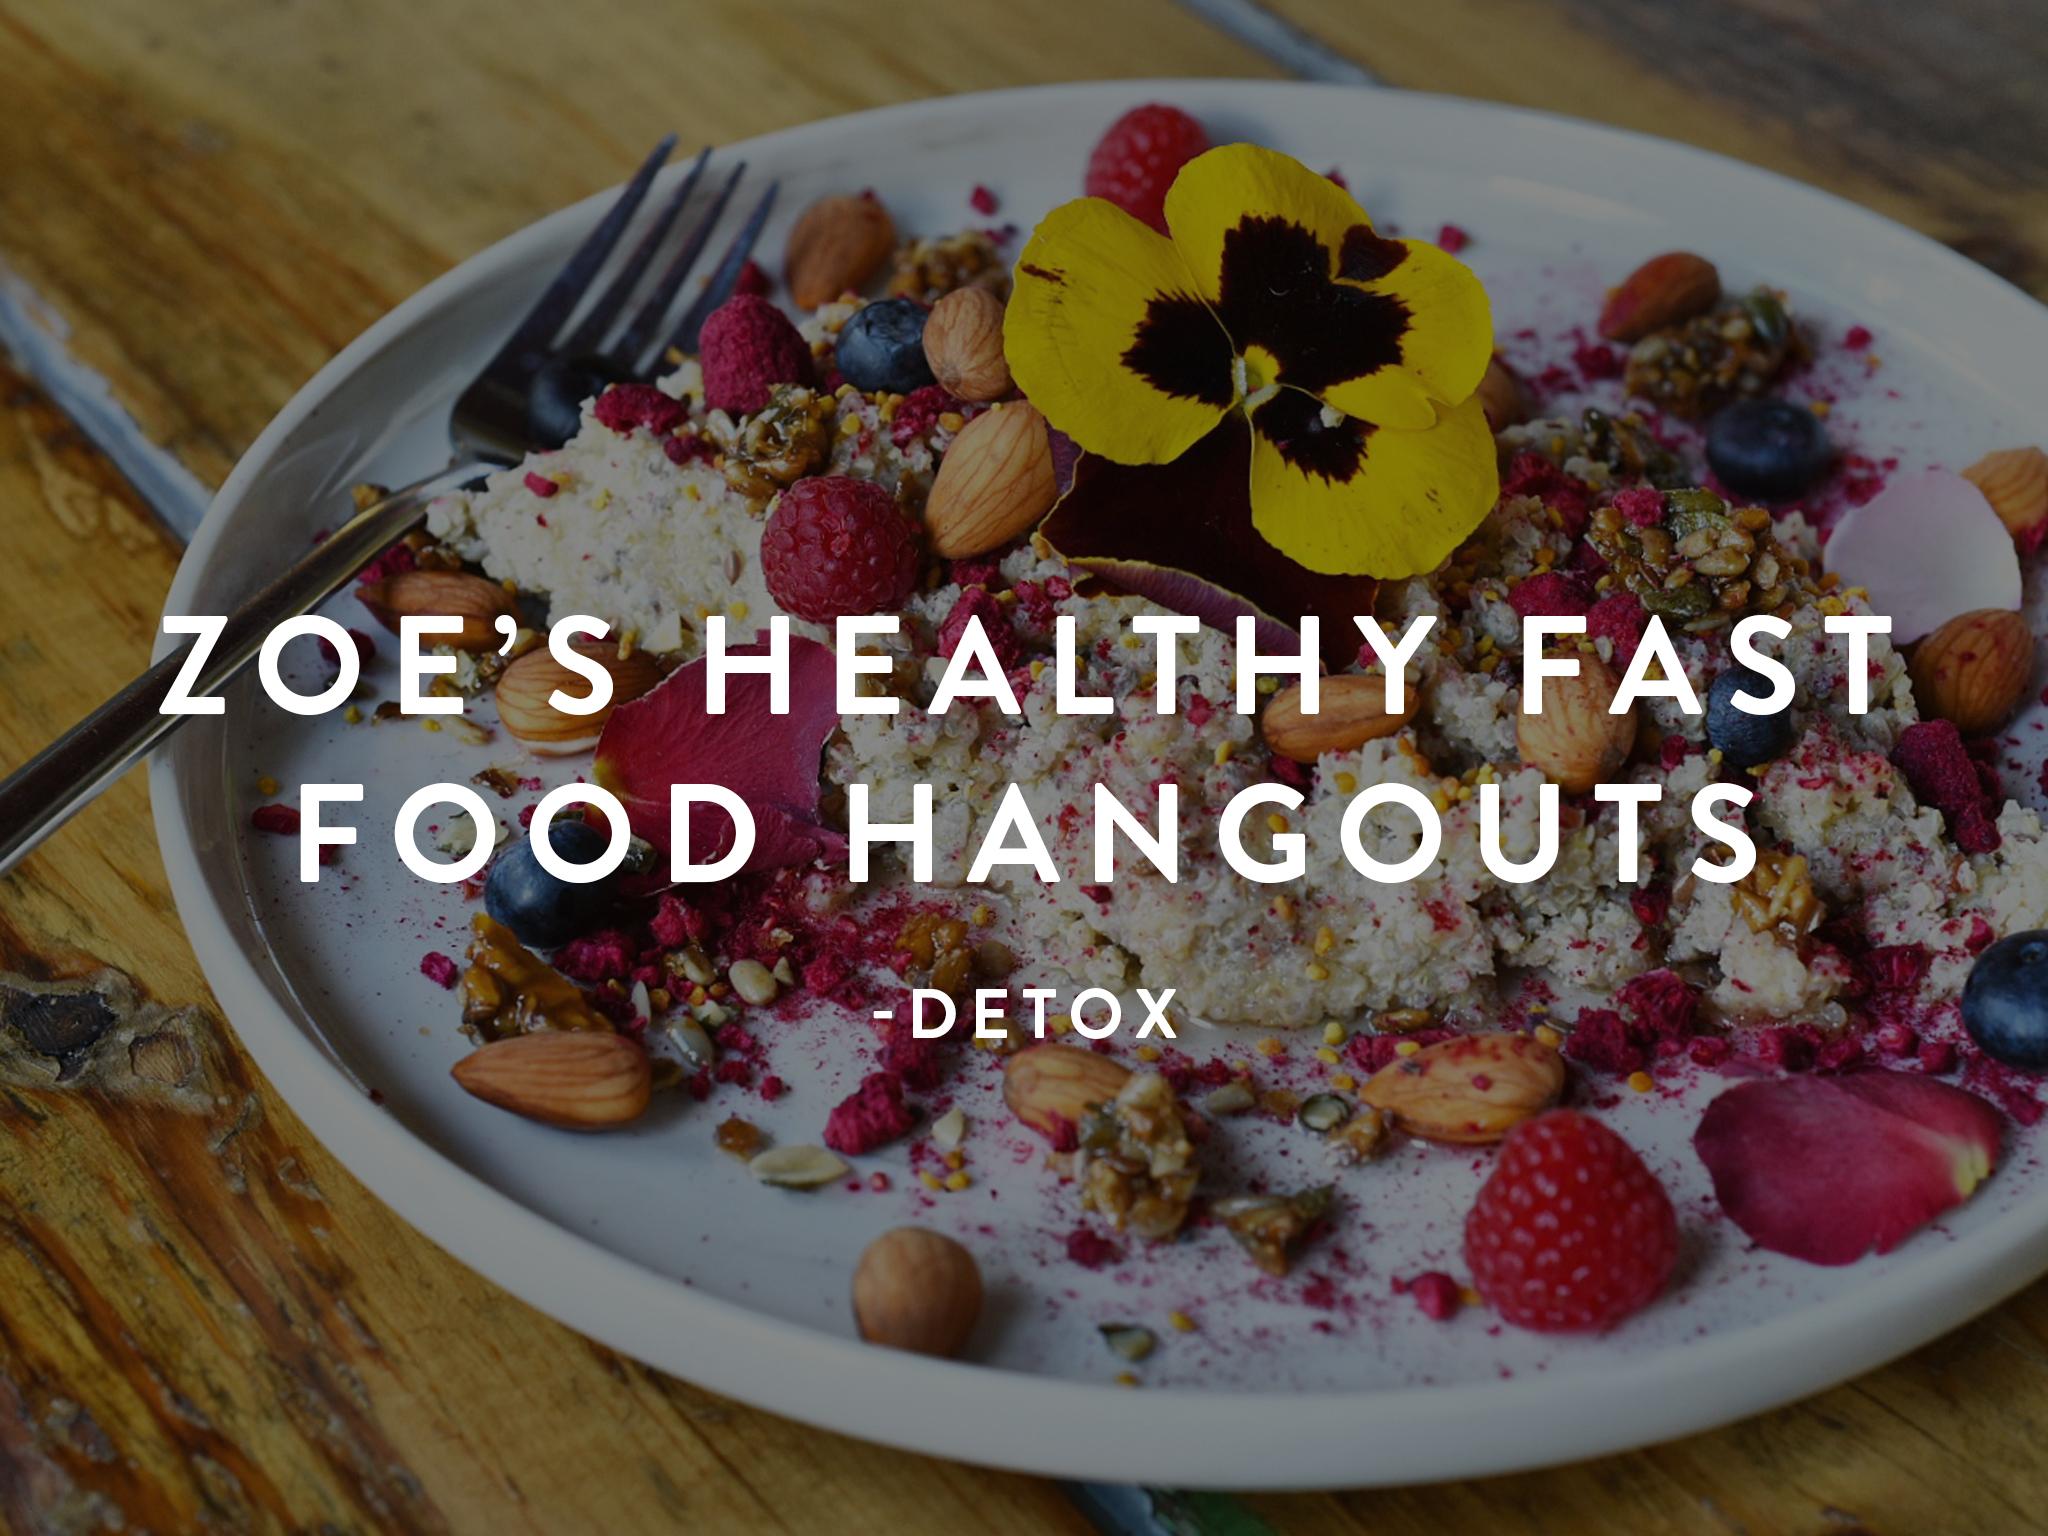 Zoe's healthy fastfood hangouts